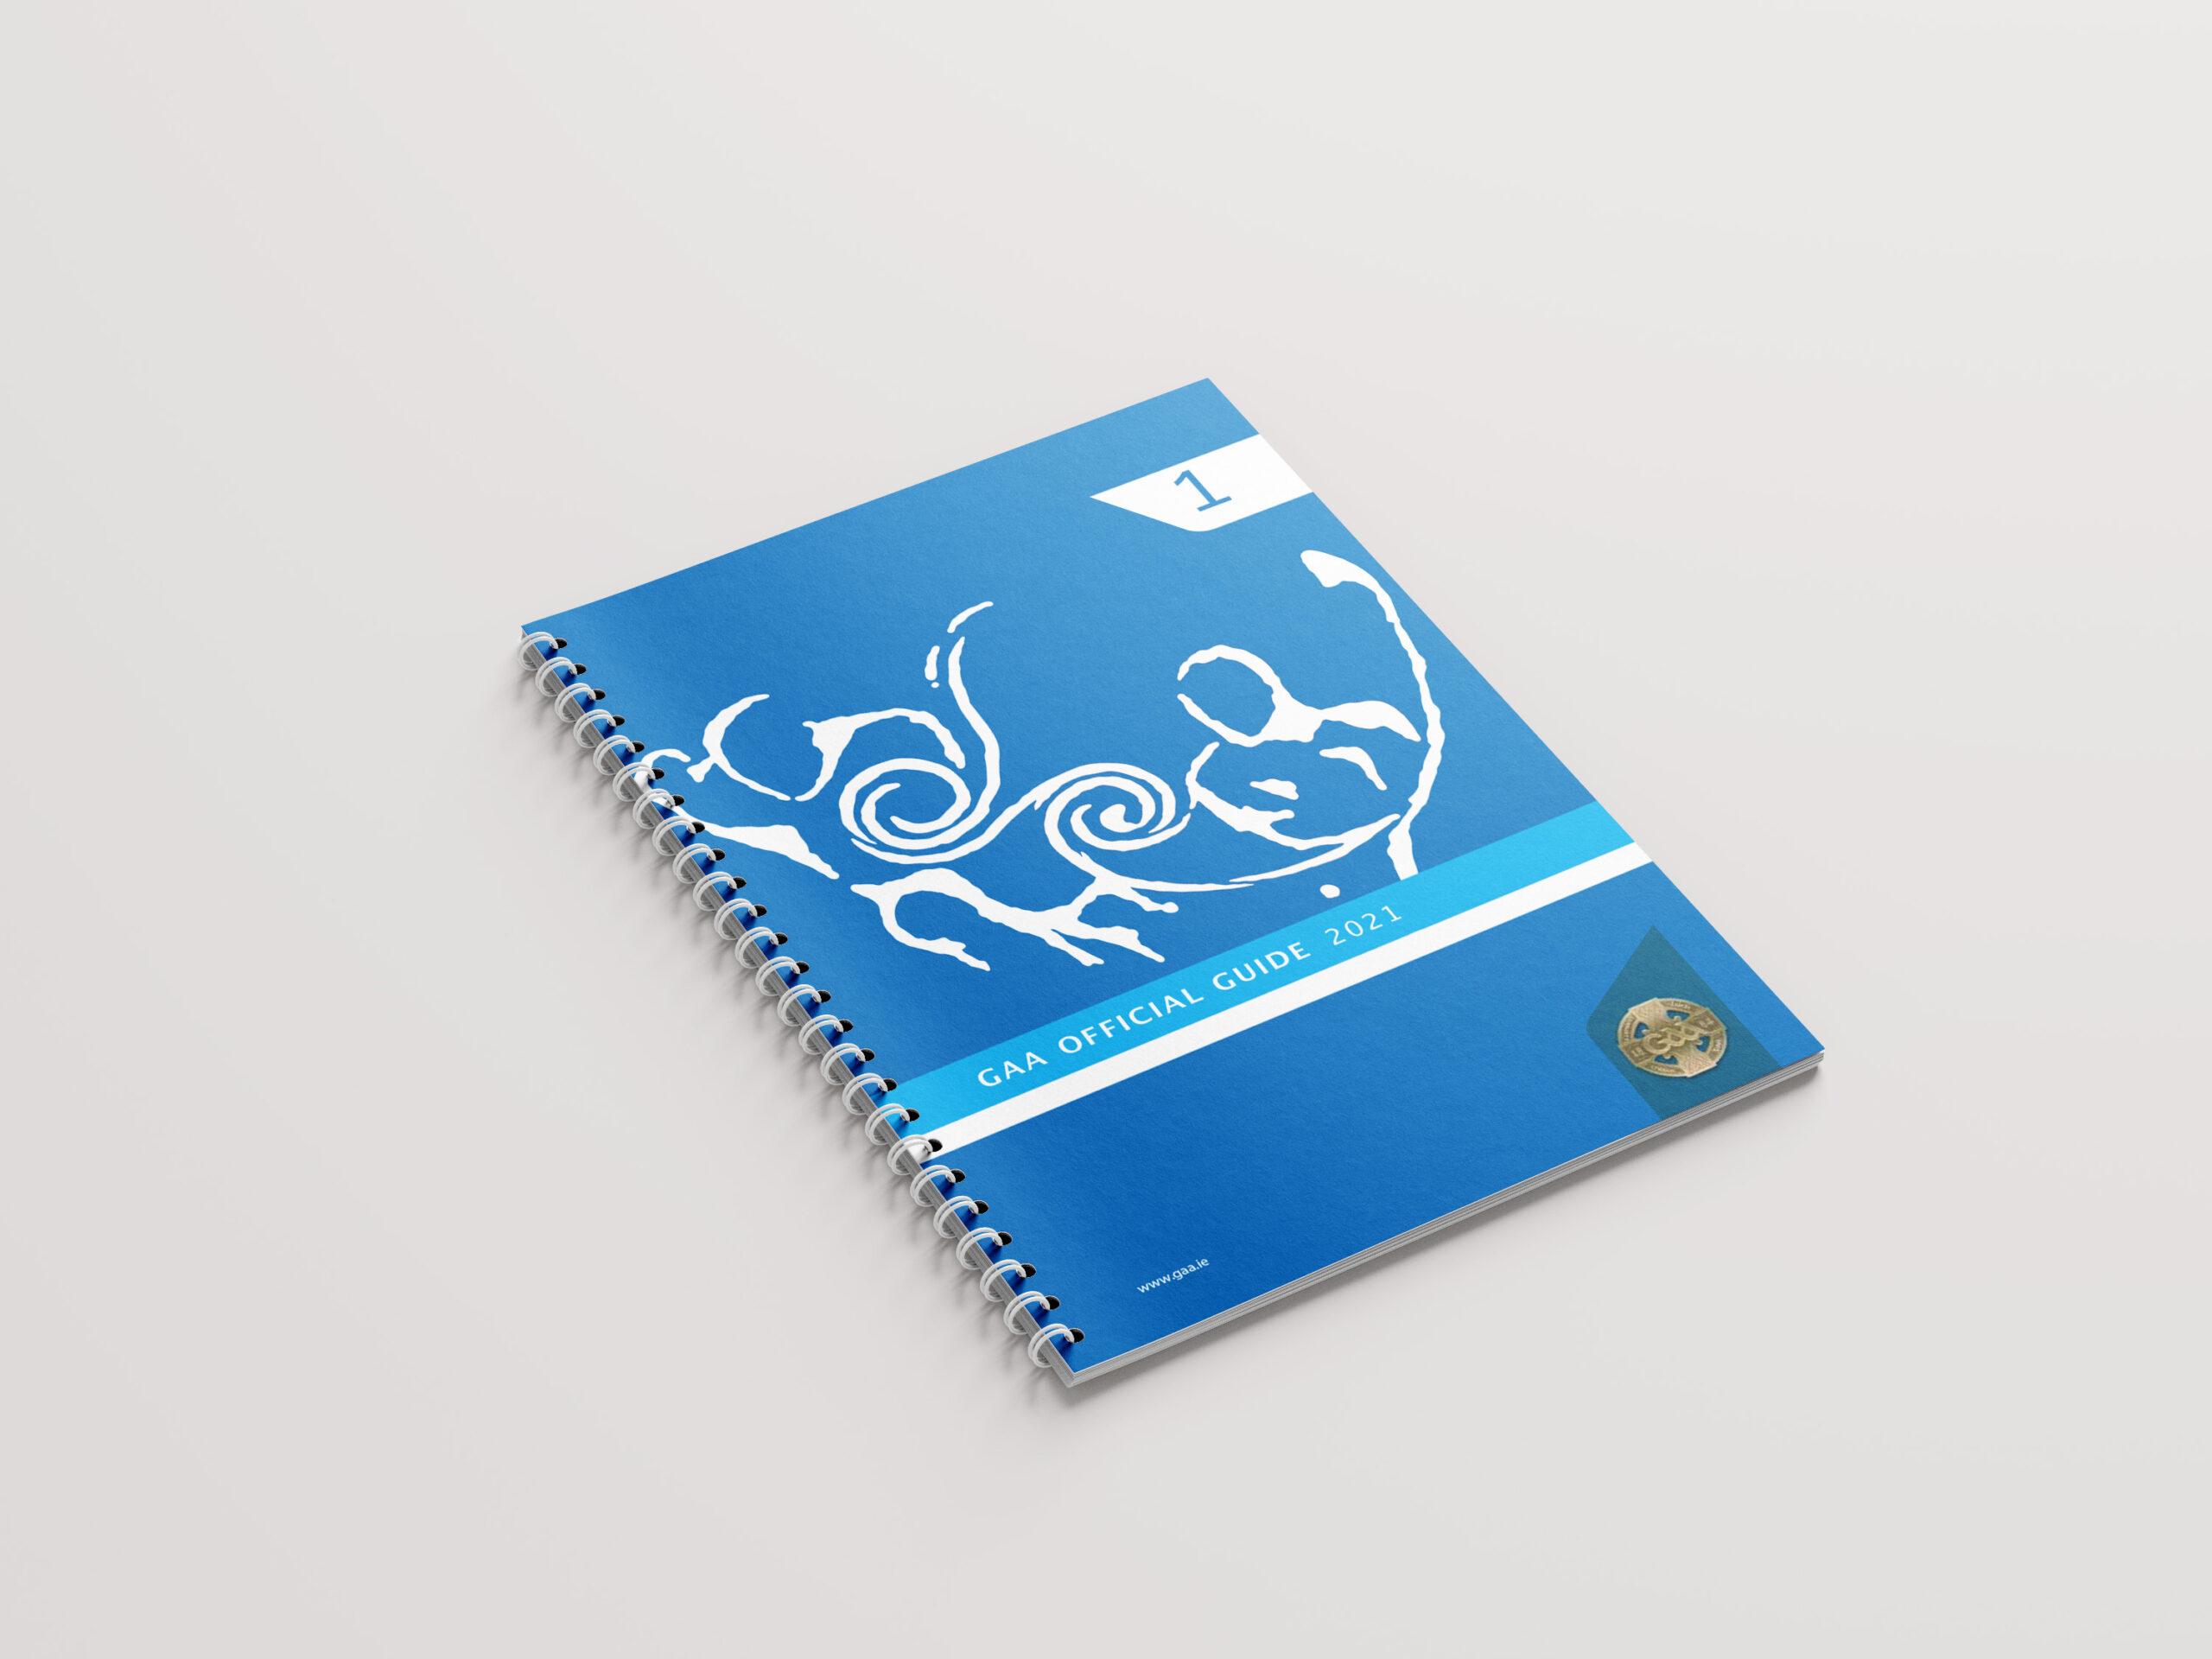 Wiro-bound GAA Rule book